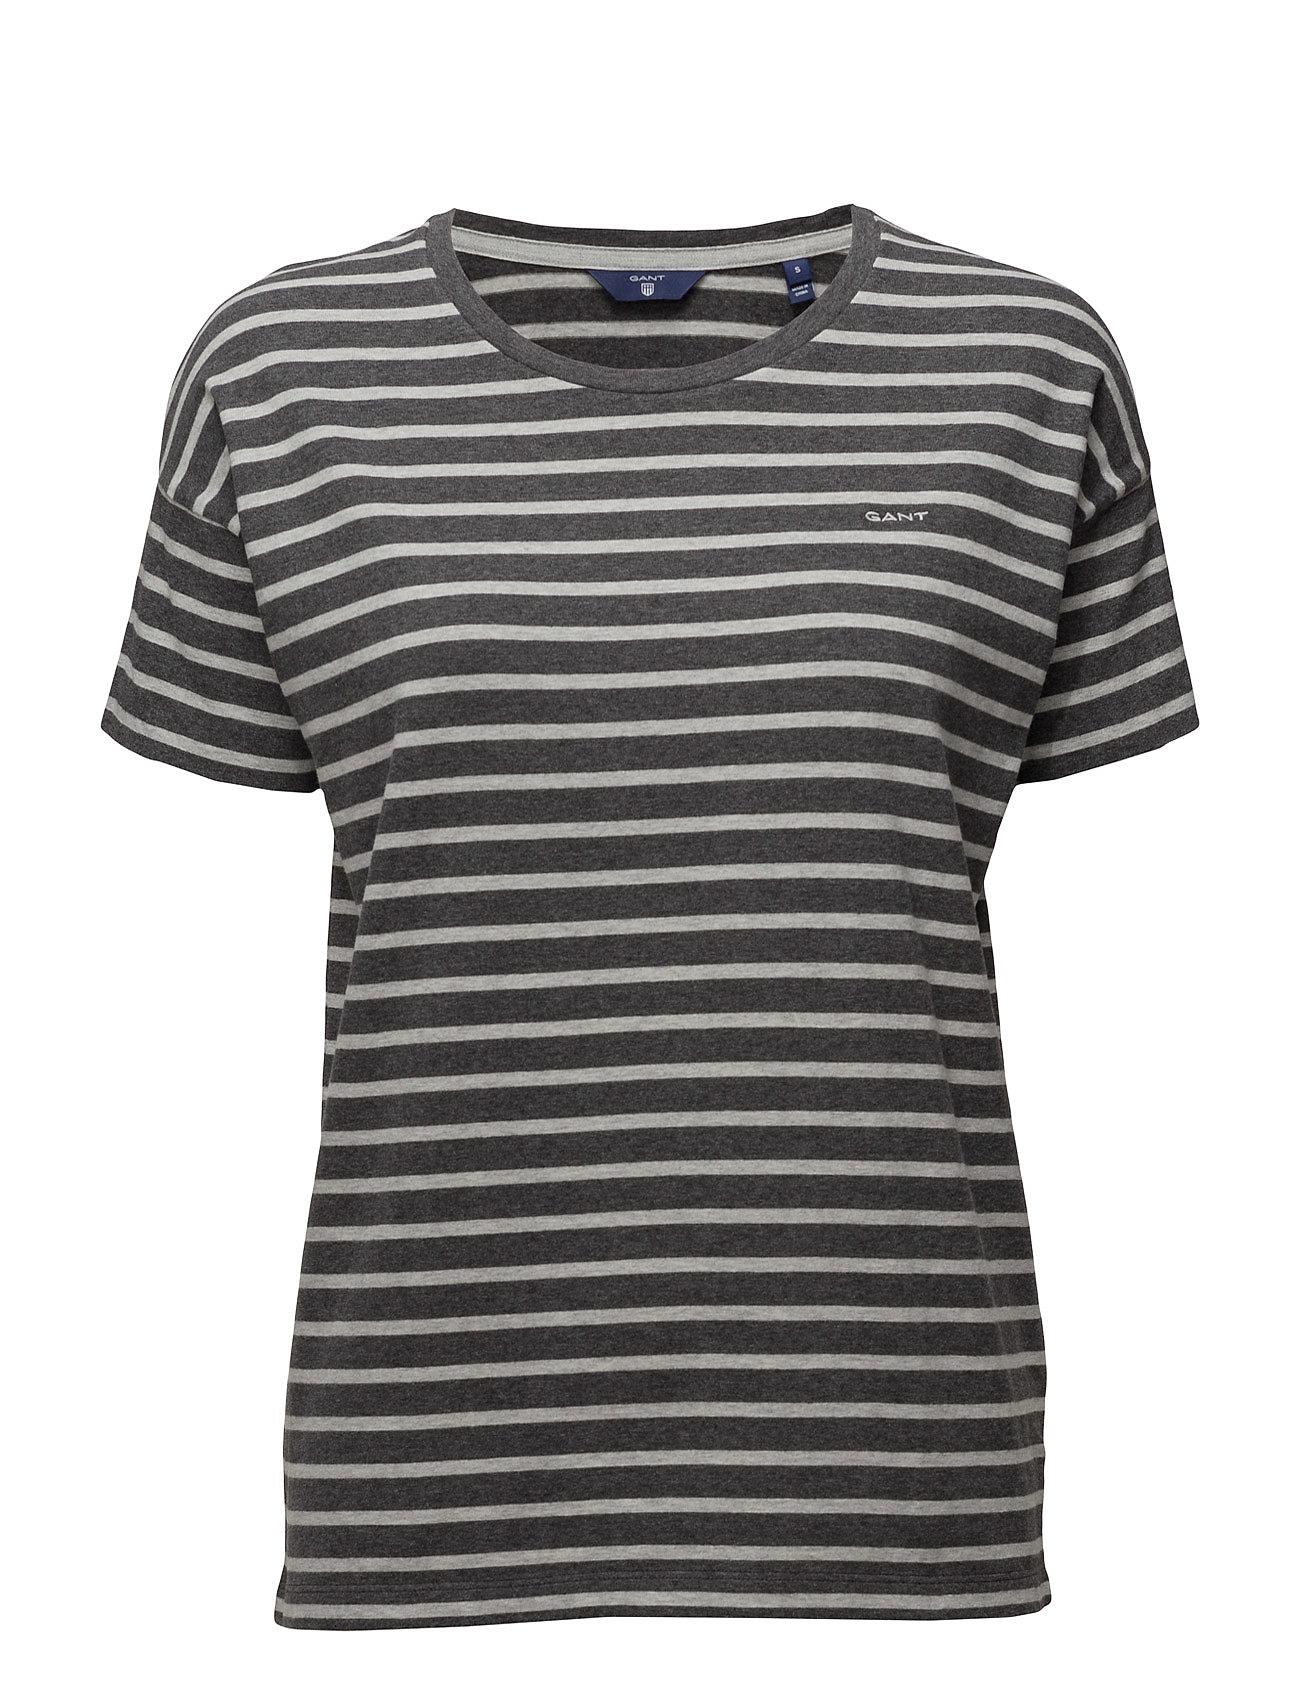 O. Dropped Shoulder Striped T-Shirt